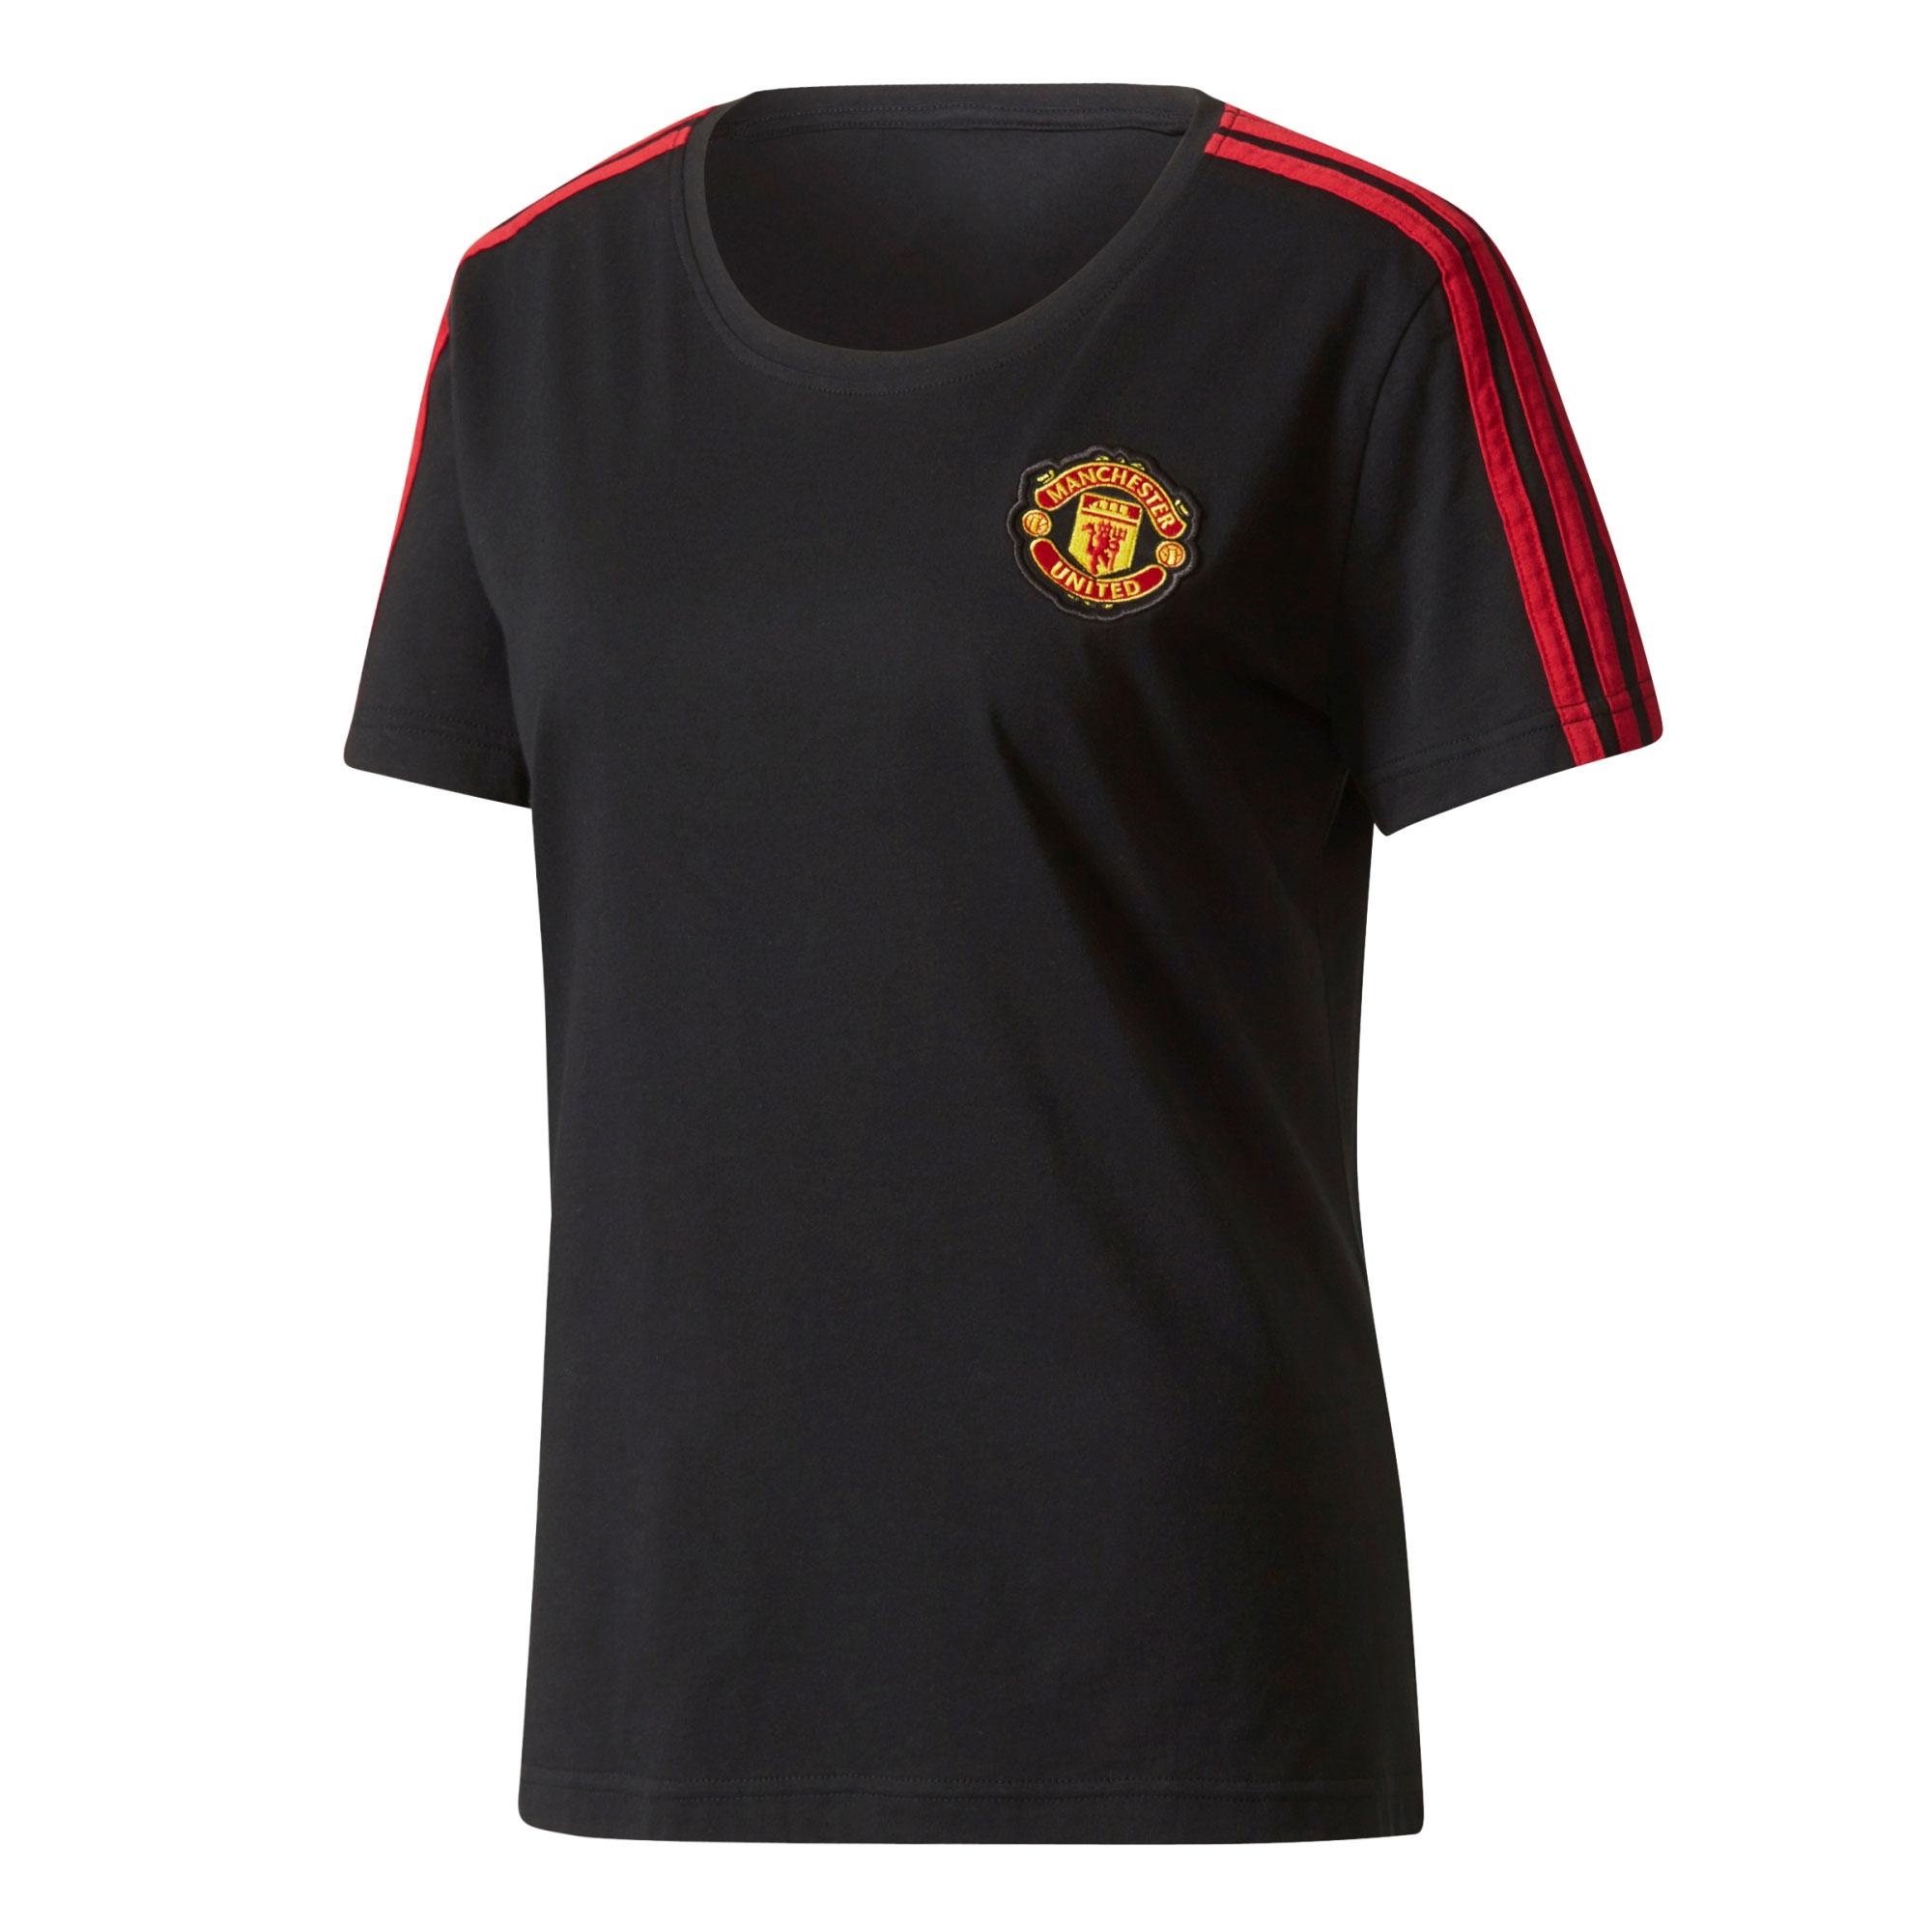 Manchester United 3 Stripe T-Shirt - Black - Womens